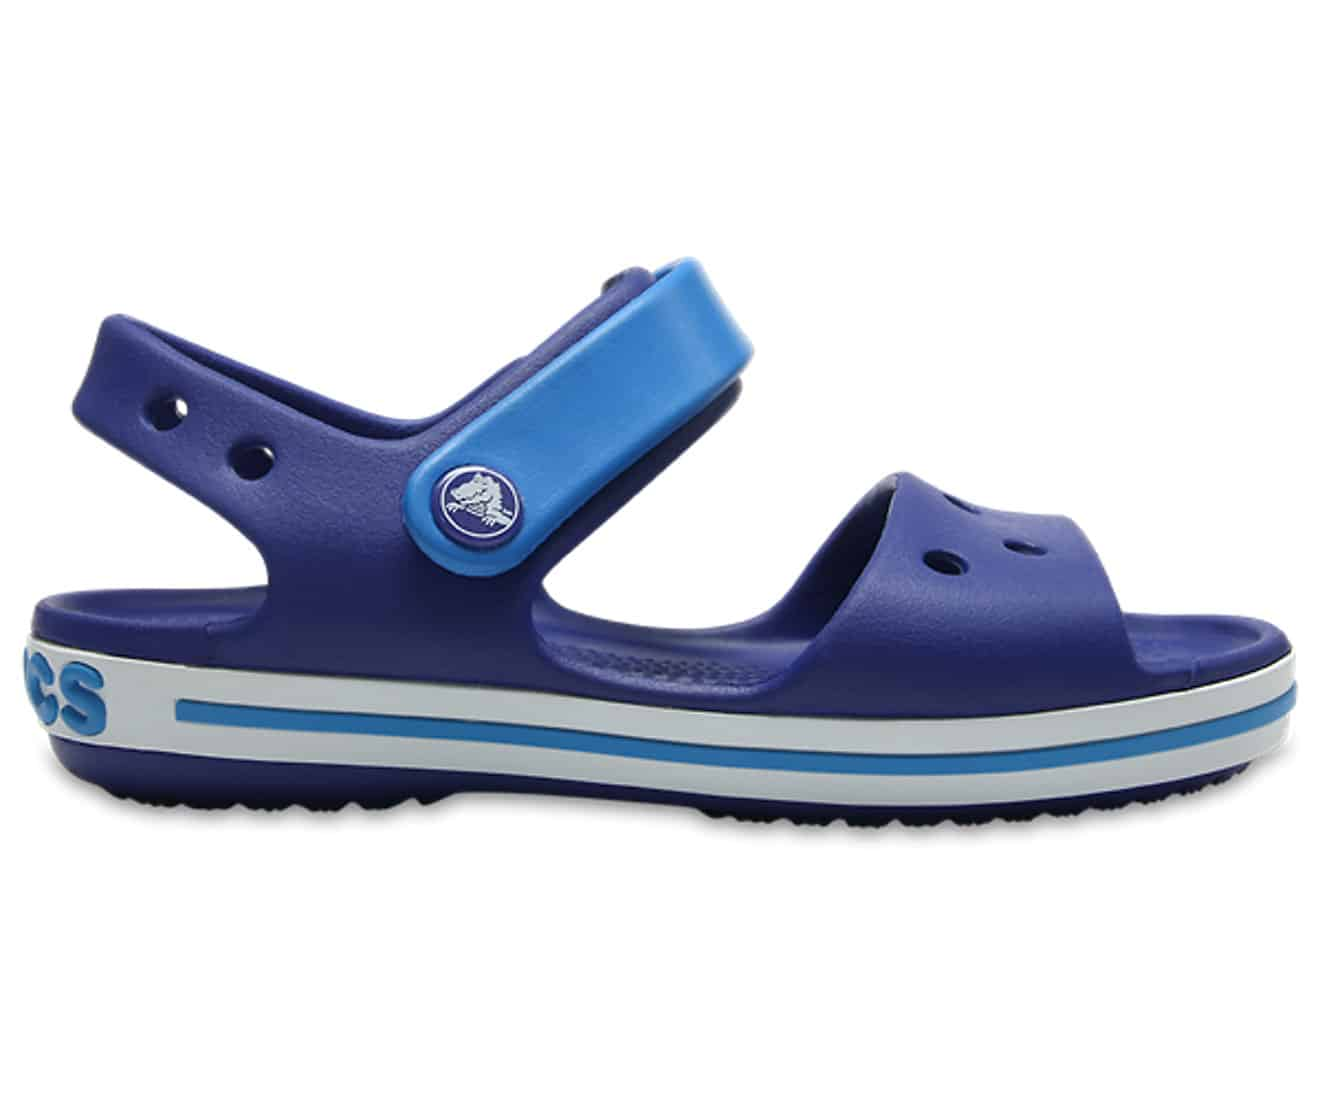 Crocs Crocband Sandal Kids Cerulean Blue Ocean 12856 - 4BX